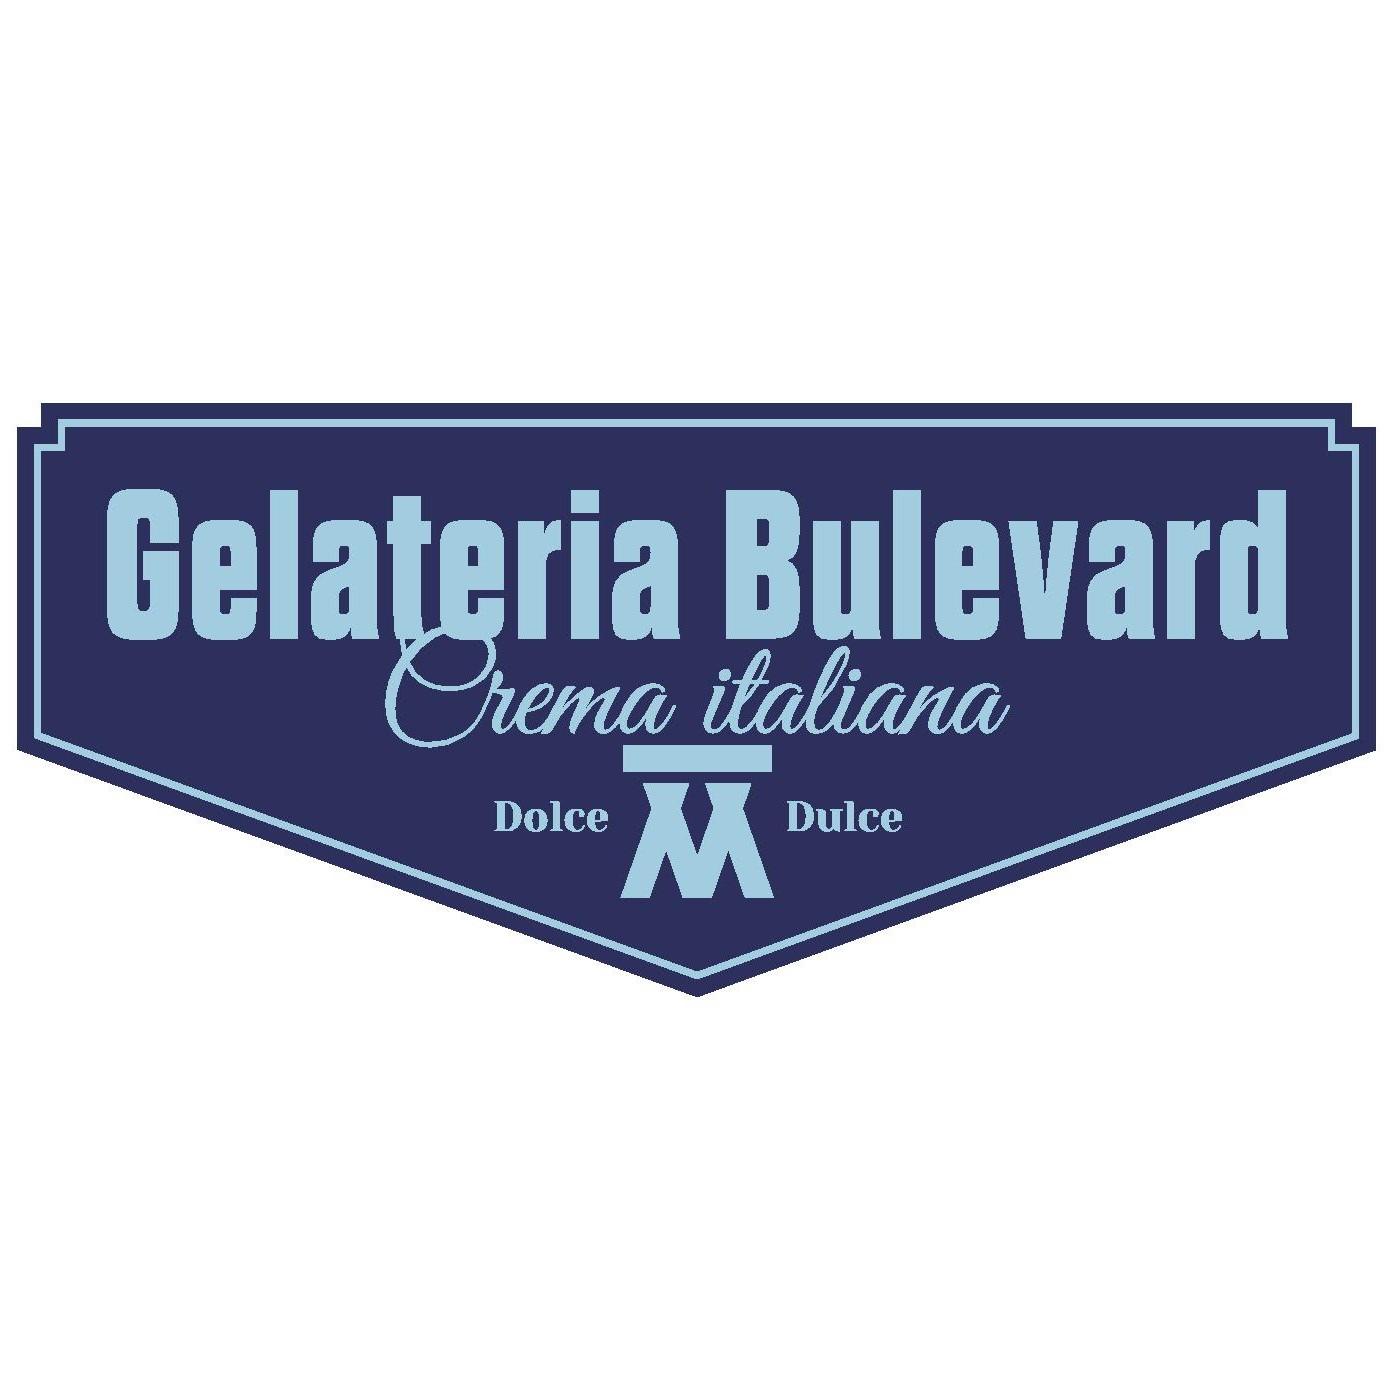 gelateria bulevard M